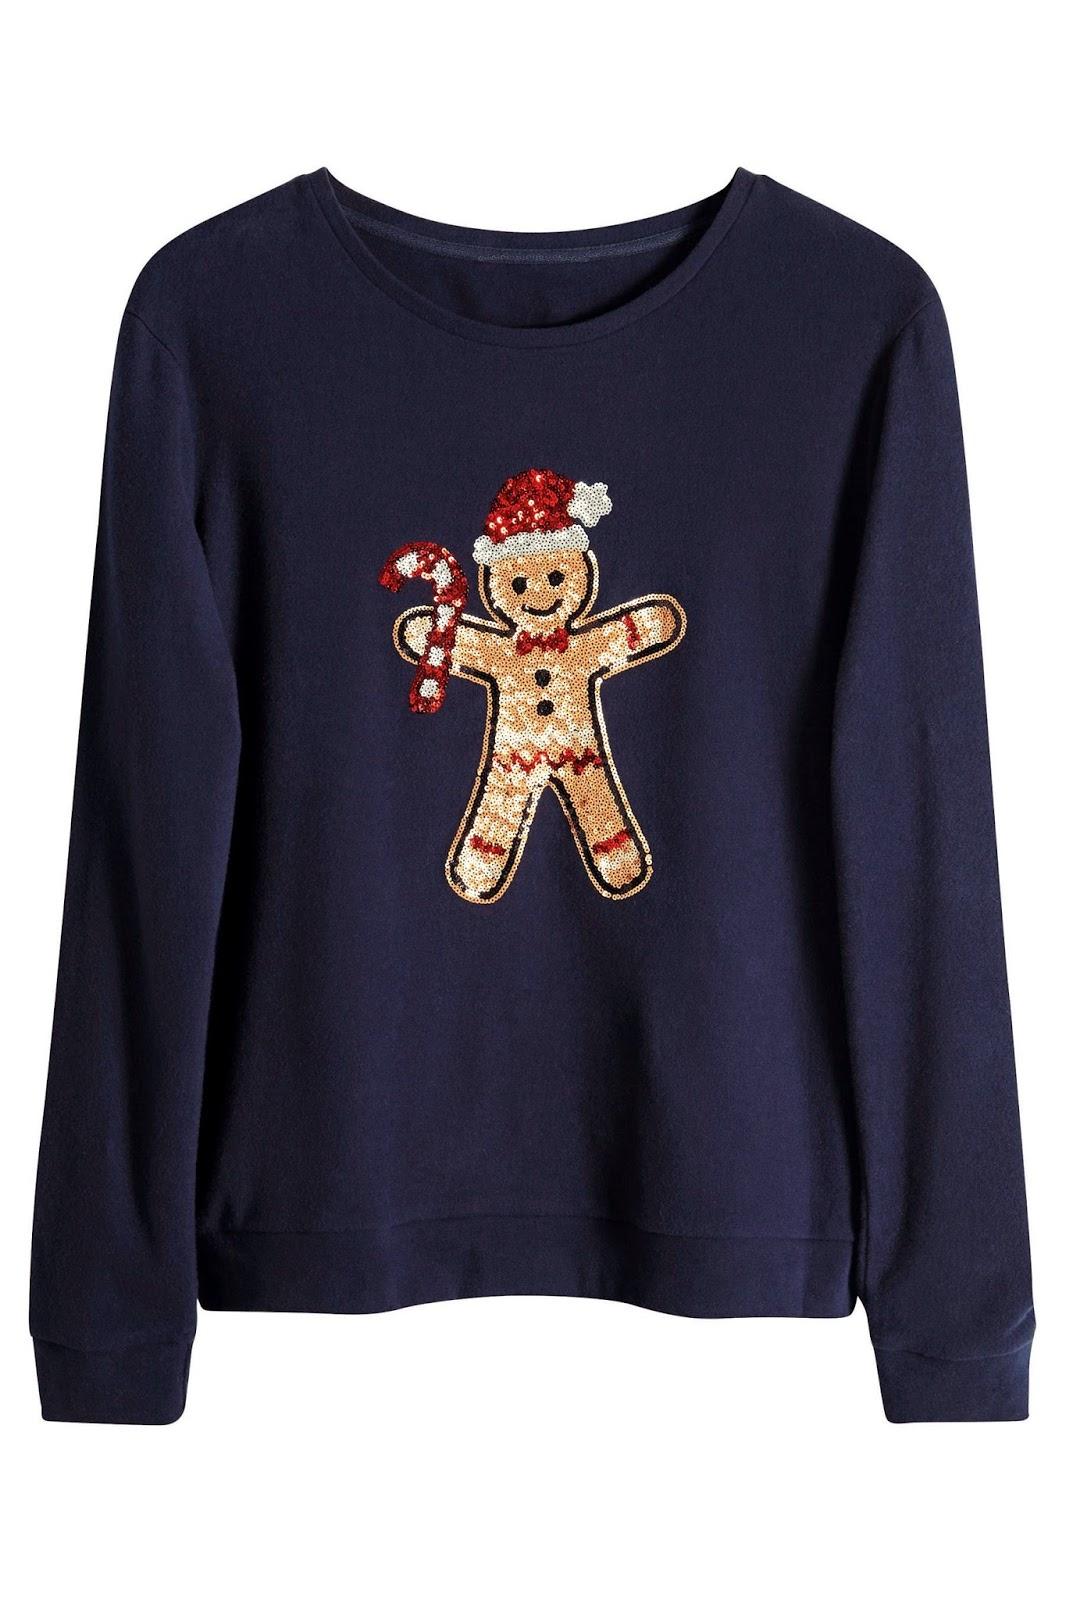 gingerbread jumper, christmas gingerbread ladies jumper, next sequin christmas ladies jumper,